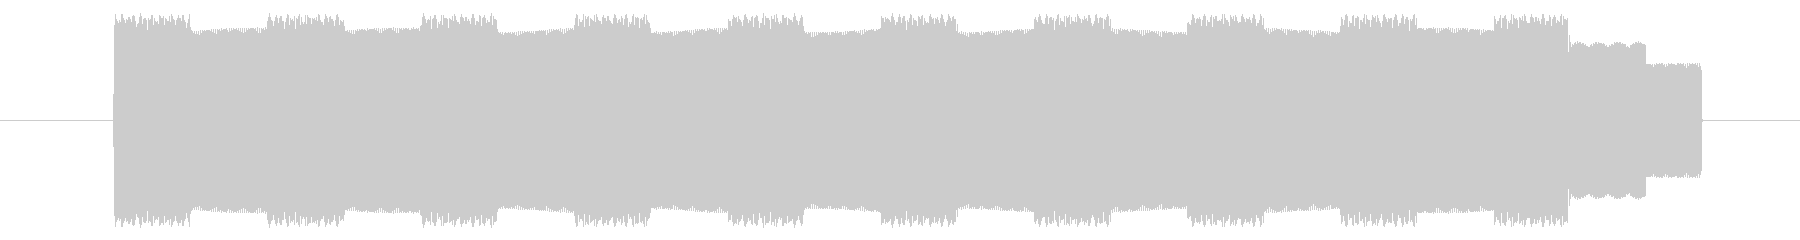 GB シューティング01-10(スコア)の未再生の波形